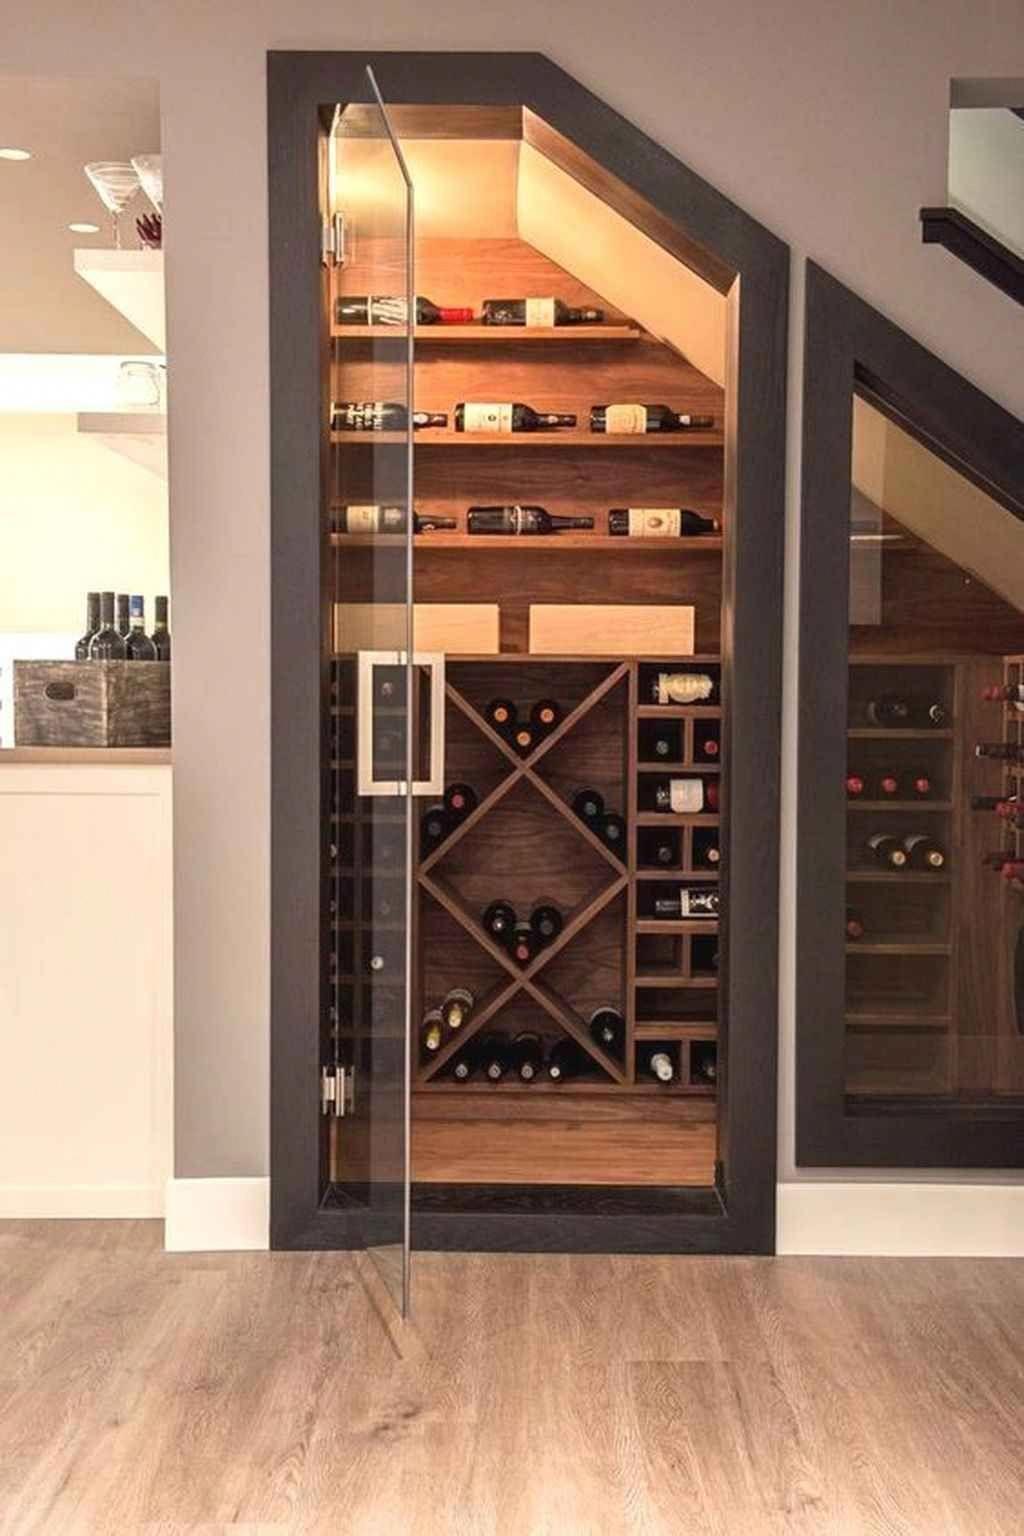 Basement Renovations Tips In 2020 Wine Cellar Basement Under